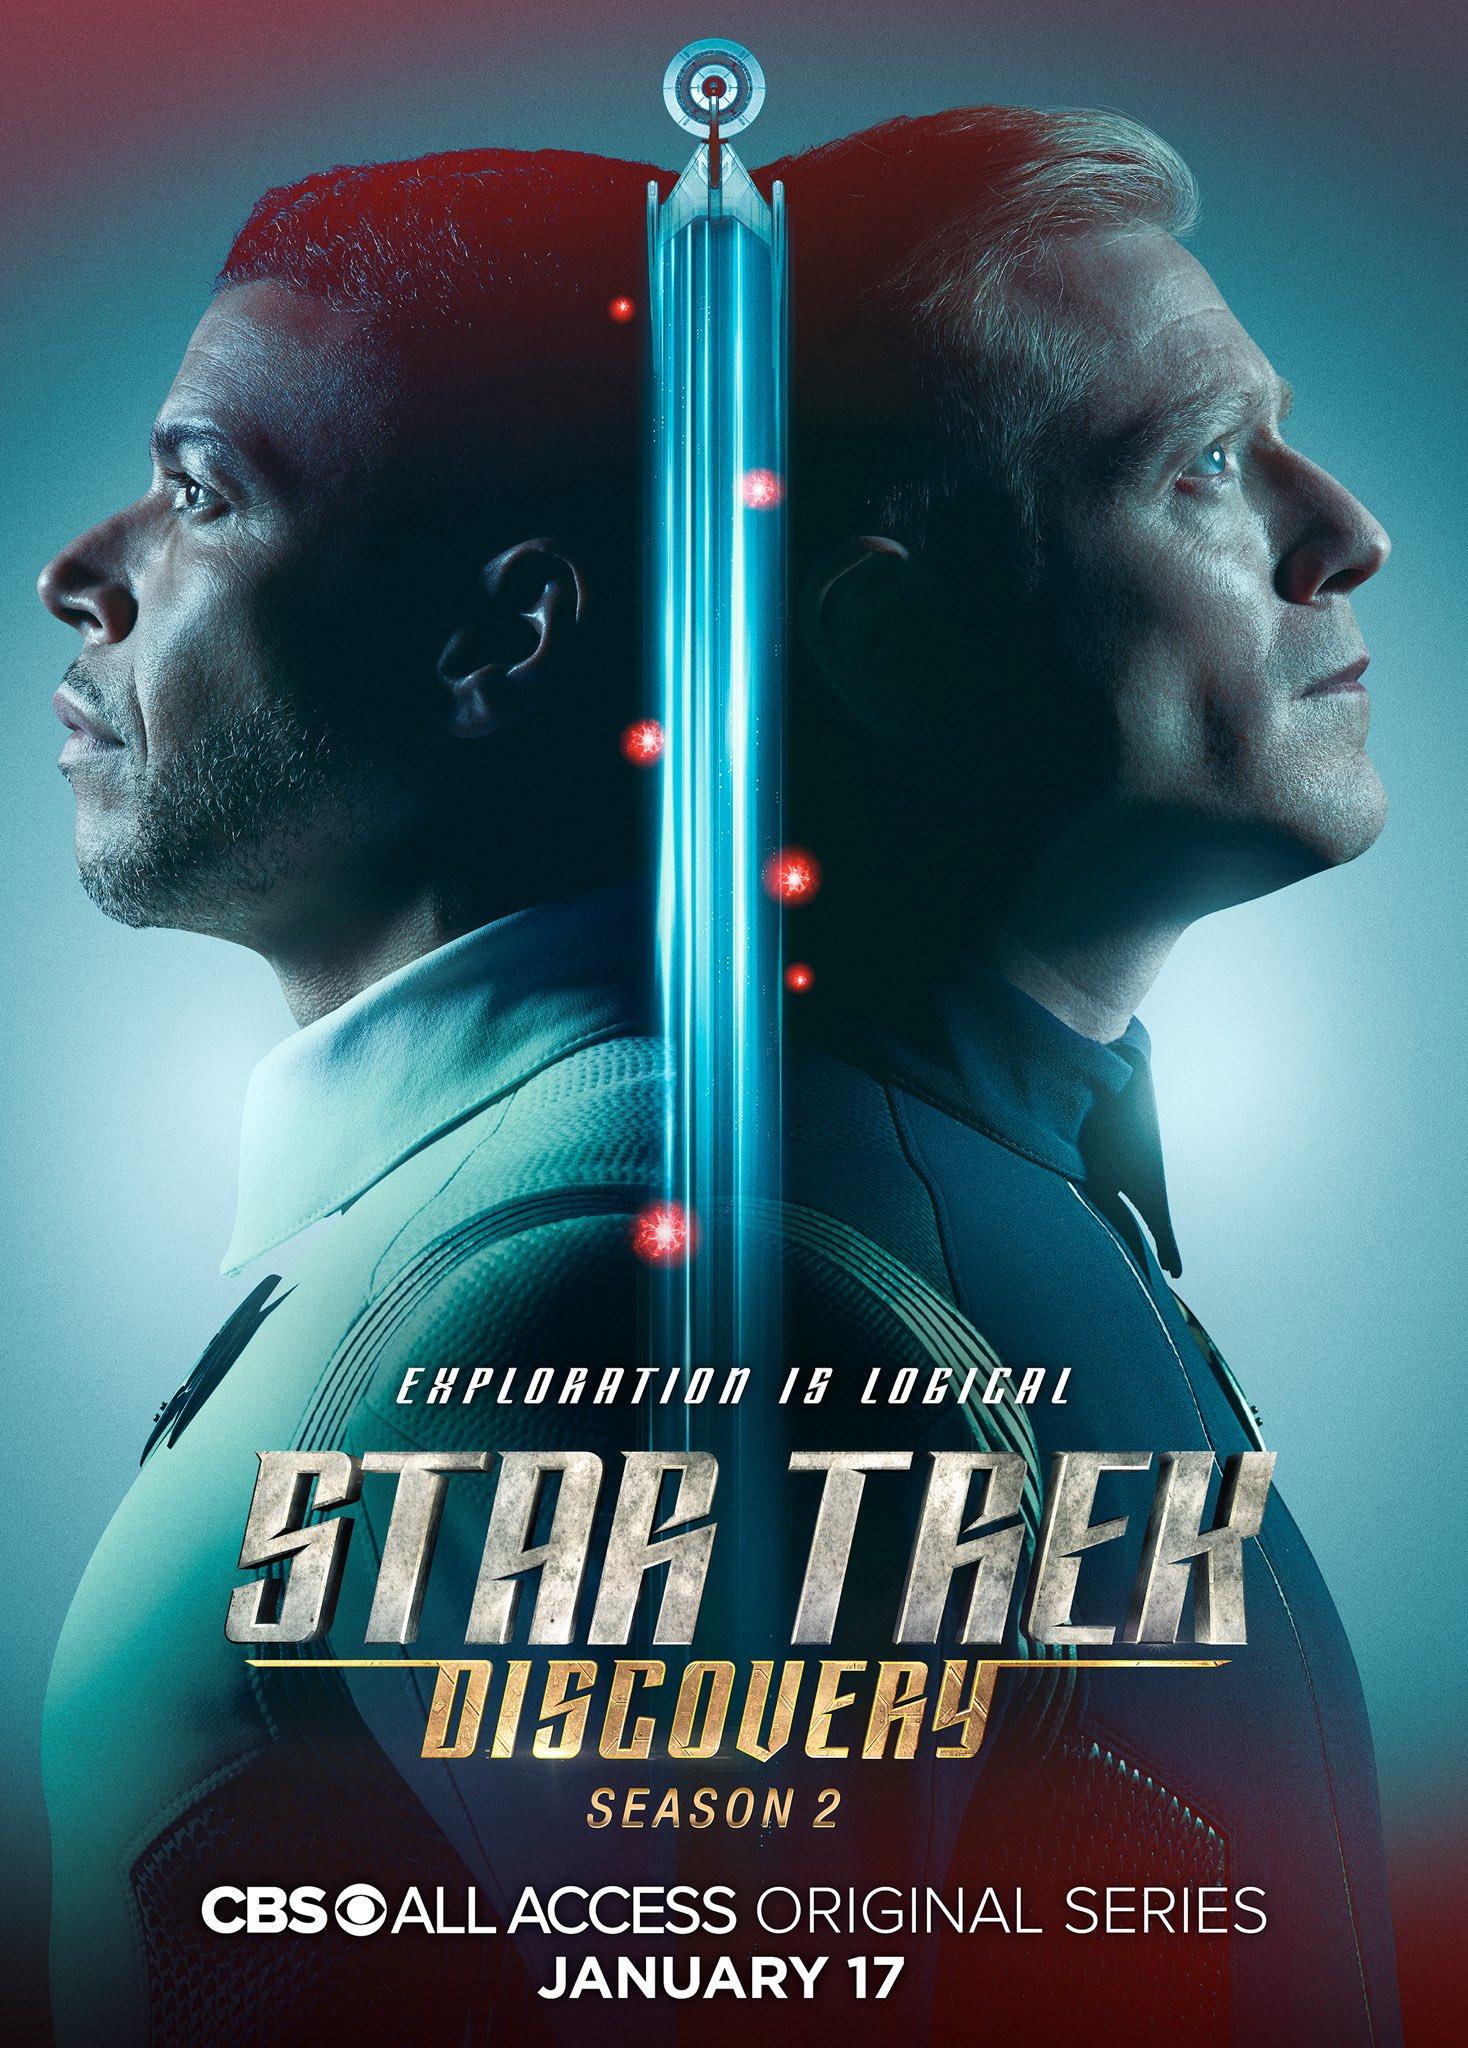 Star Trek Discovery Season 2 Hugh Culber and Paul Stamets poster.jpg